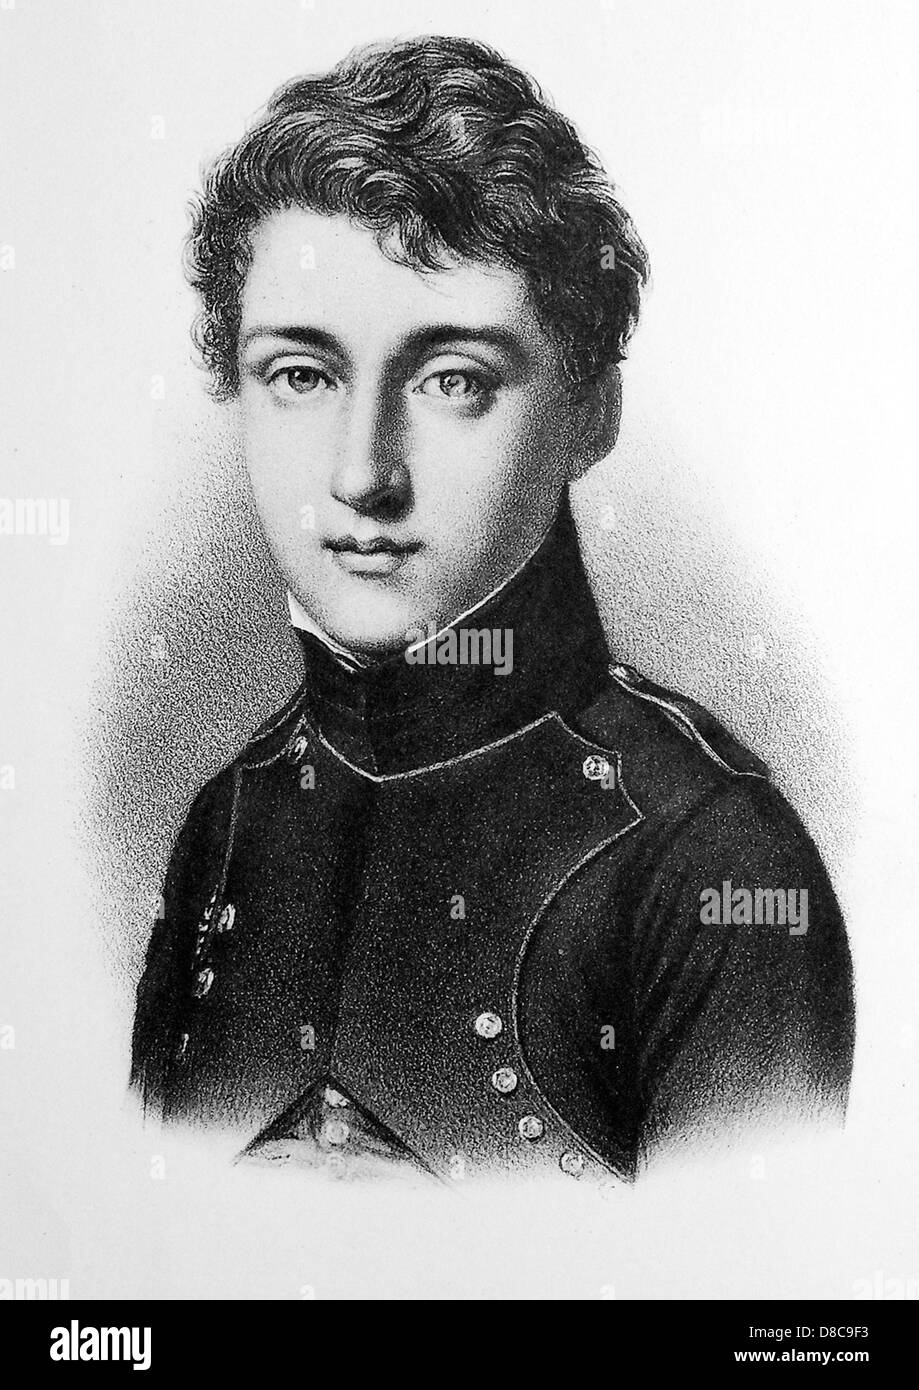 sadi carnot Nicolas léonard sadi carnot nicolas léonard sadi carnot (june 1 1796 - august 24 1832) was a french physicist and military engineer who, in his 1824.